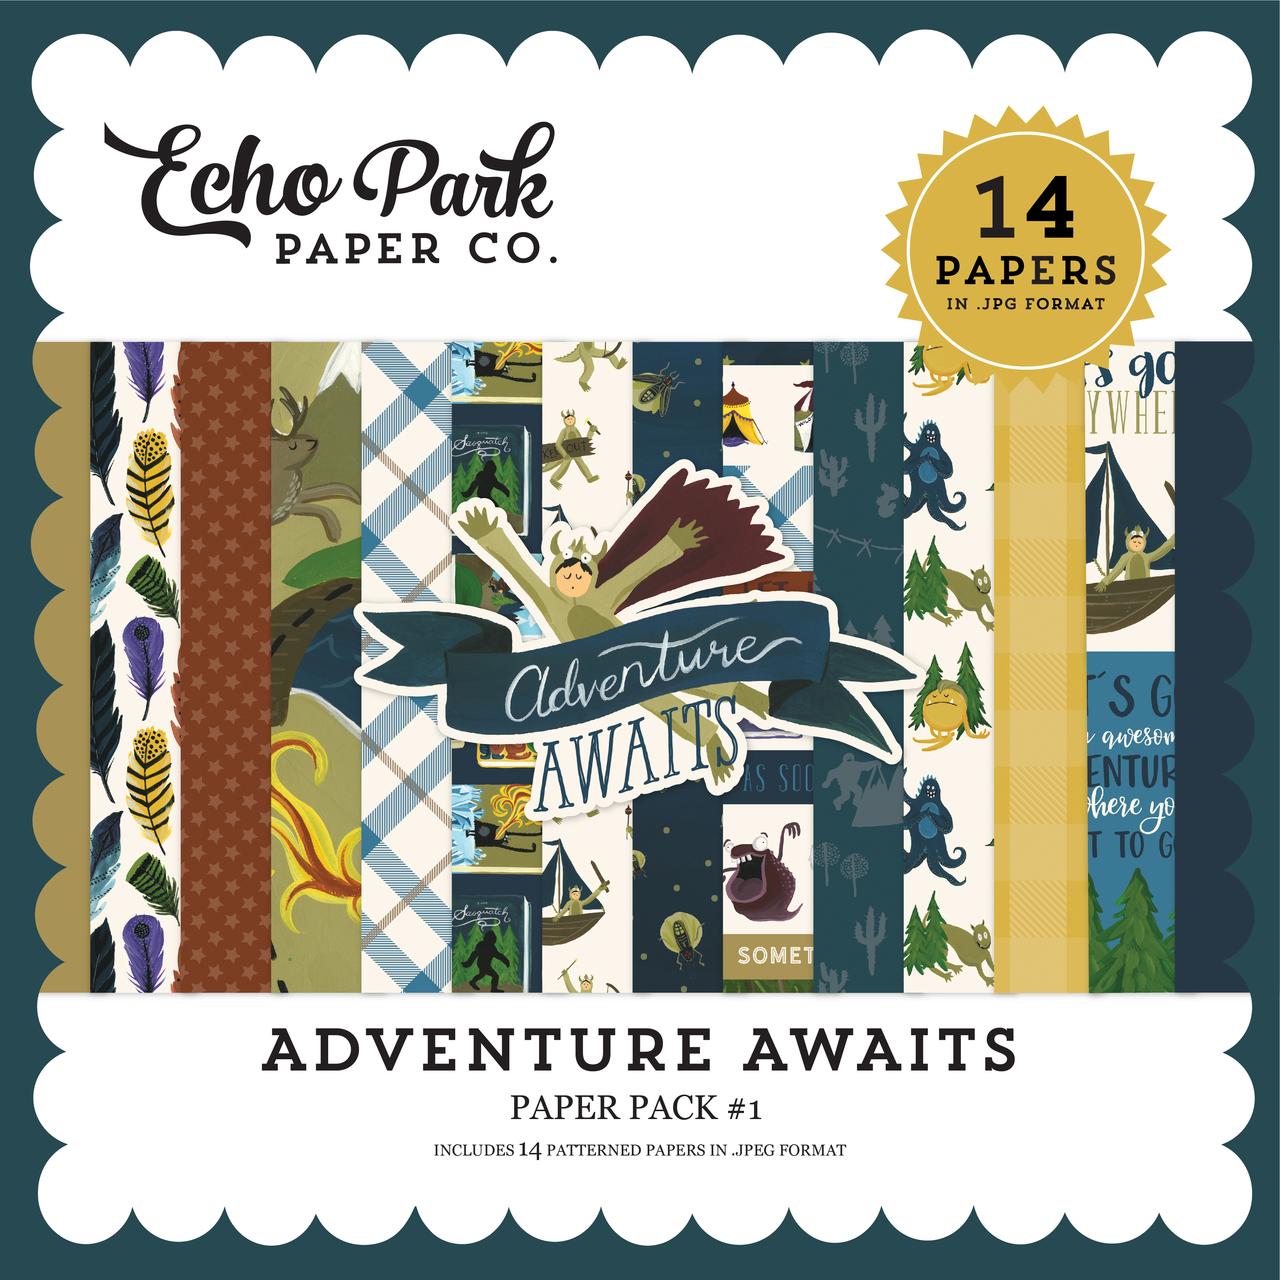 Adventure Awaits Paper Pack #1